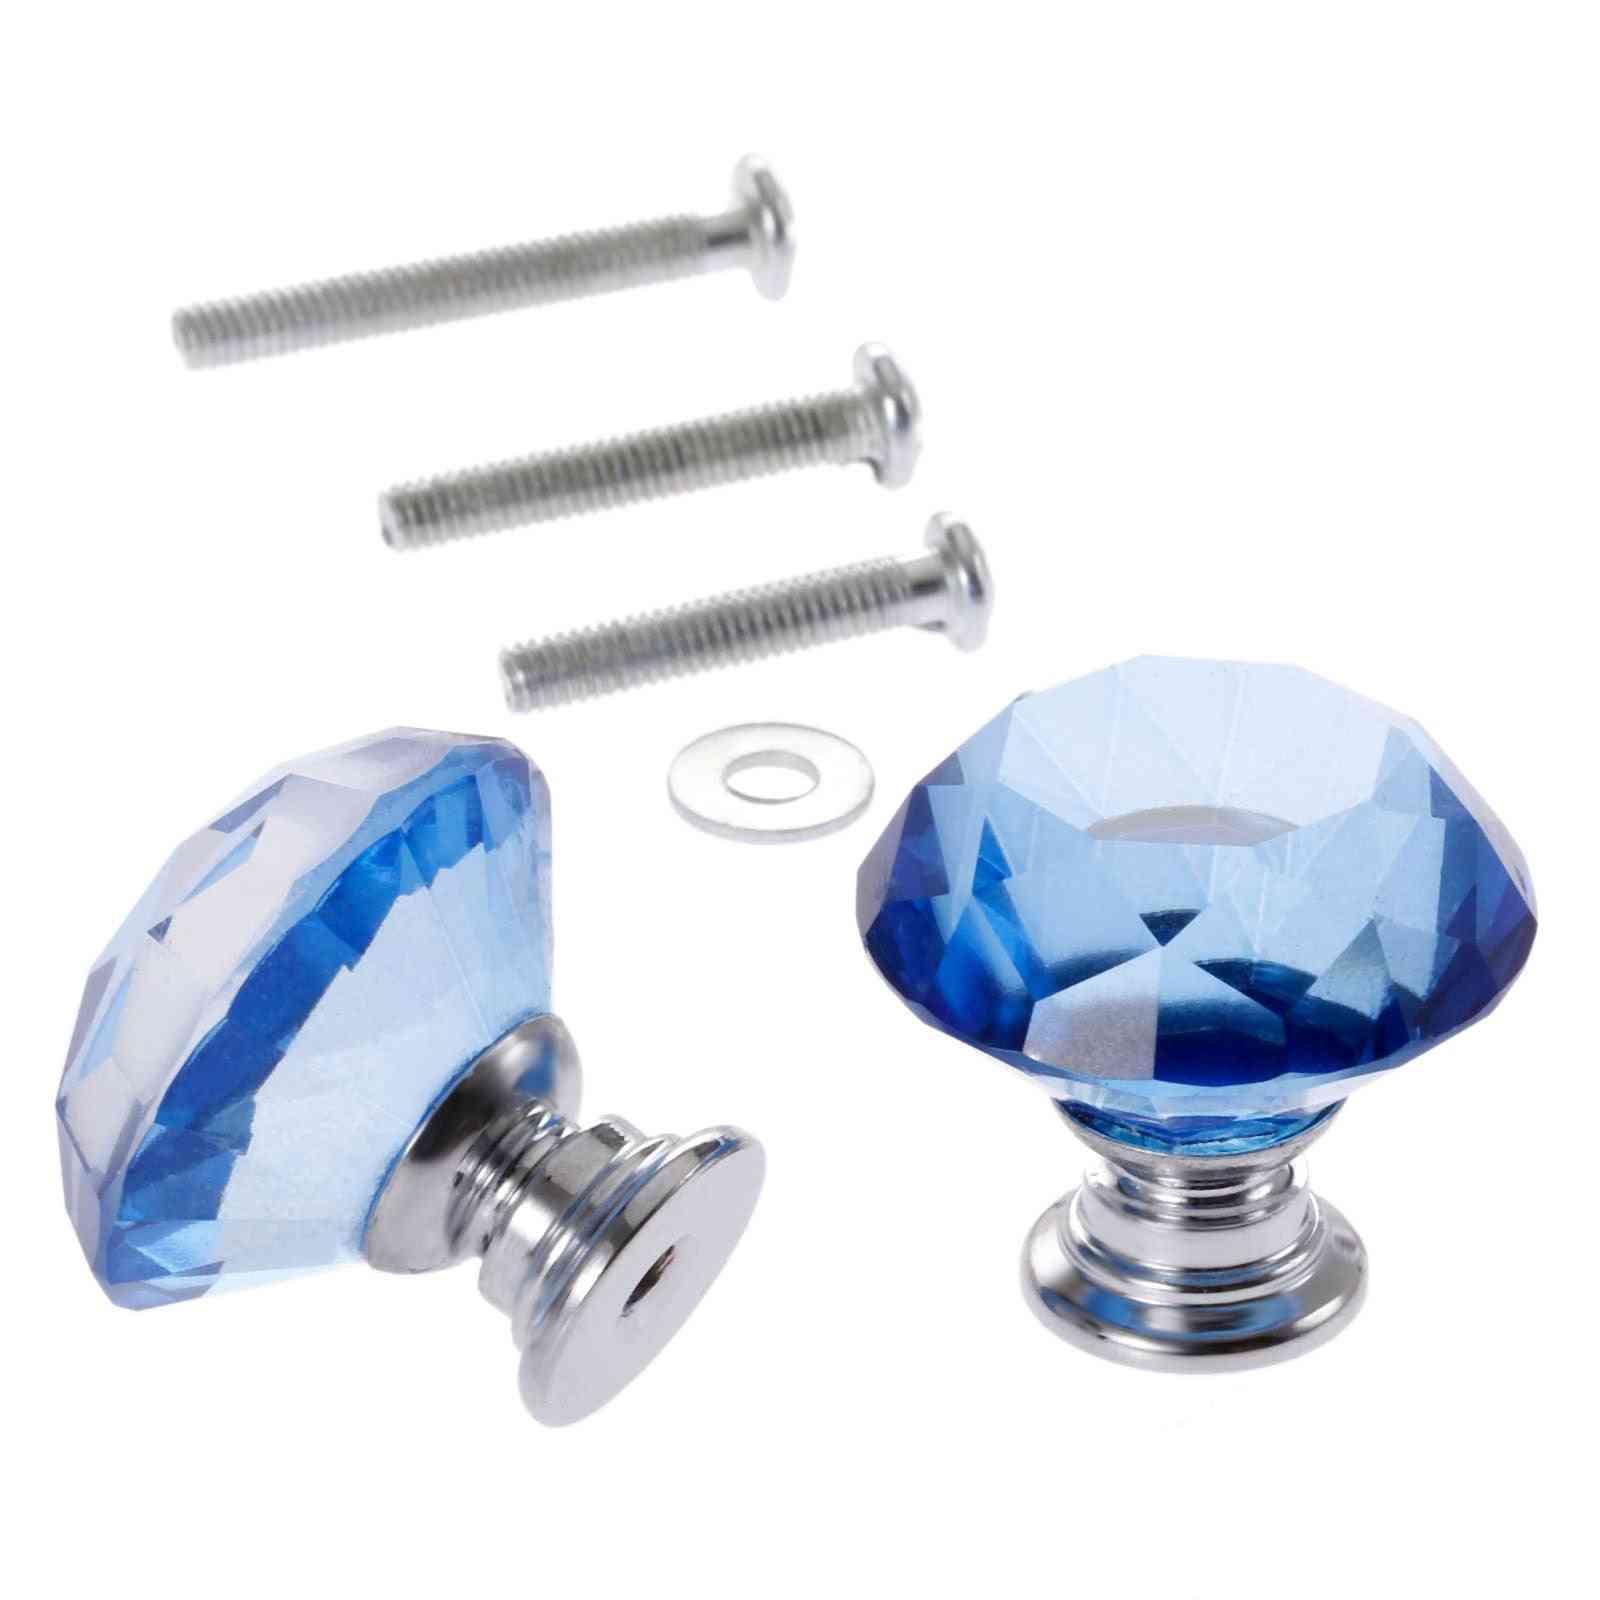 2pc Of 30mm Diamond Shape, Crystal Glass Knobs